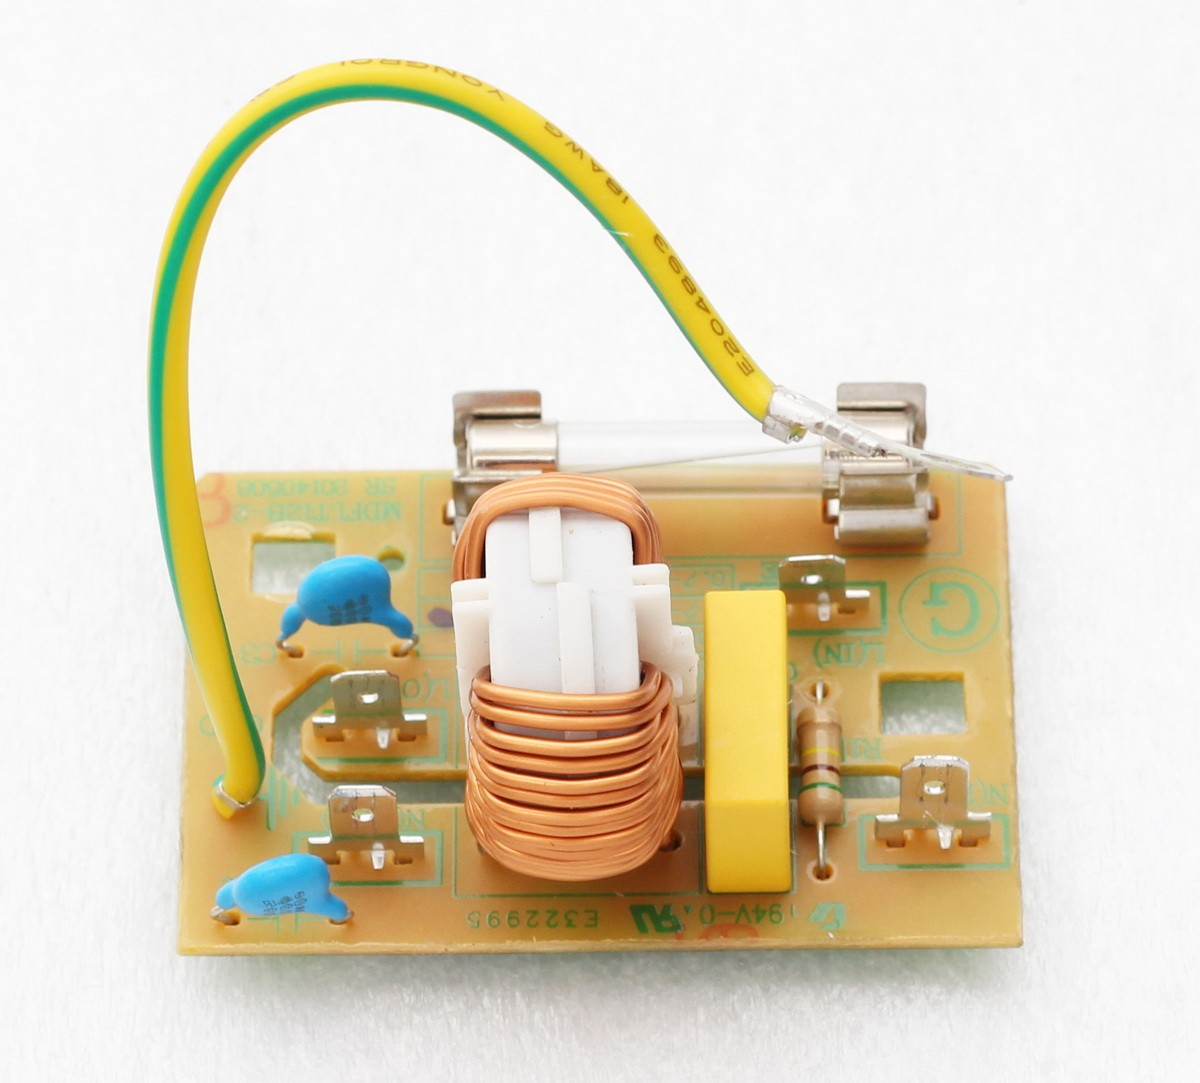 PANASONIC MDFLT12B-2 Microwave Noise Filter Input Board NN-SU676B